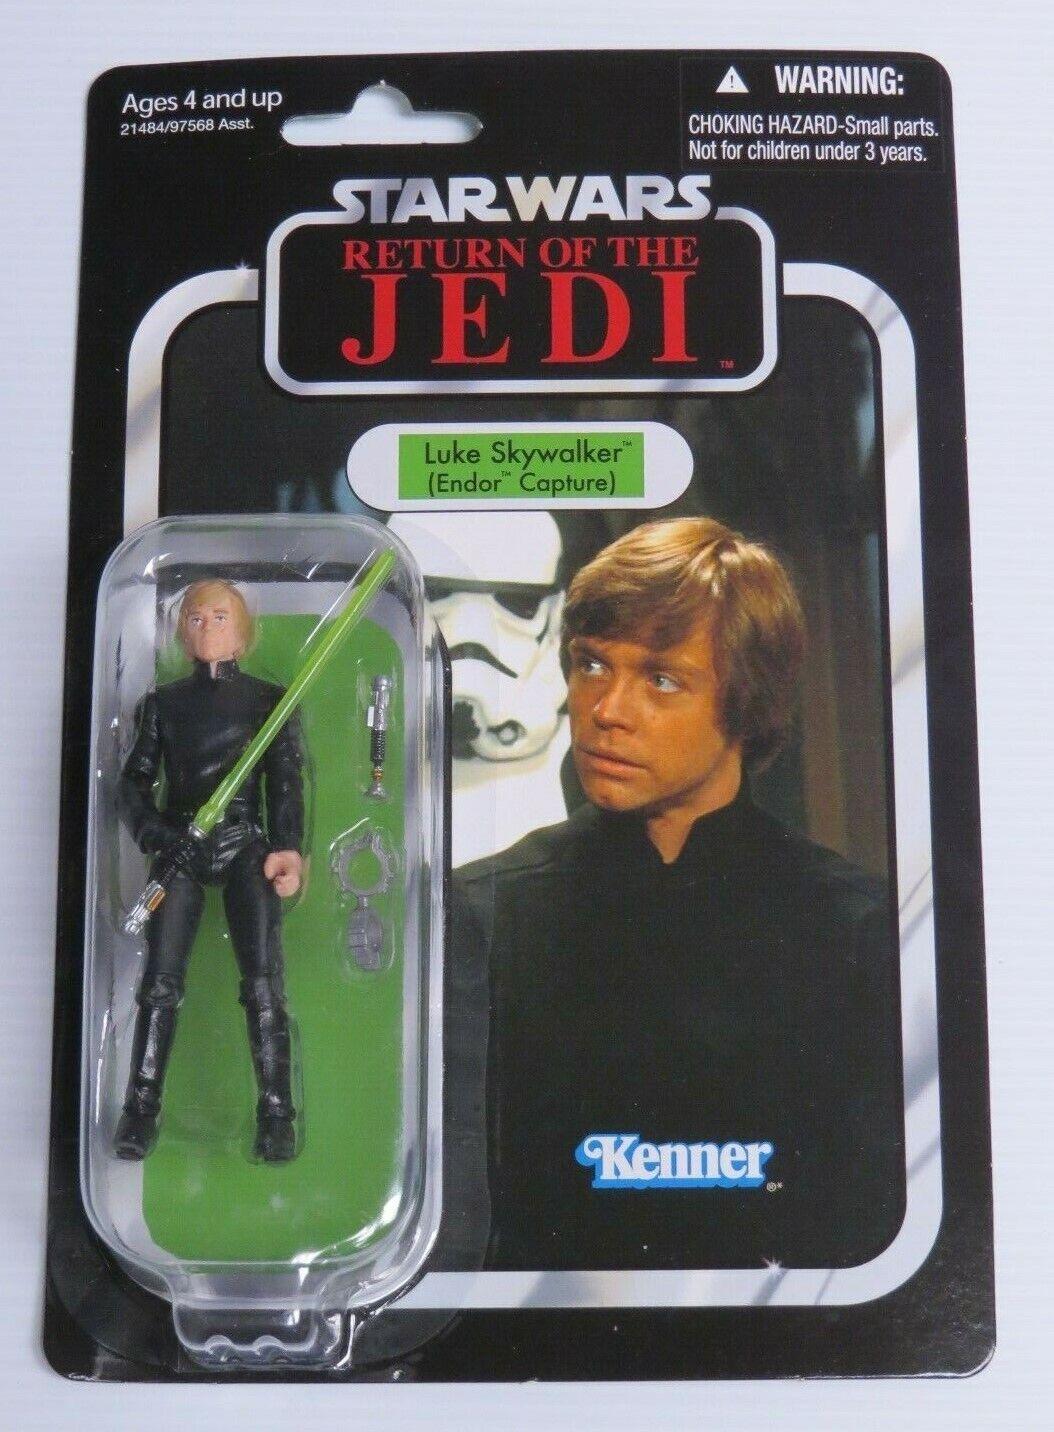 Star Wars Luke Skywalker Endor Capture figurine scellé VC23 Retour du Jedi